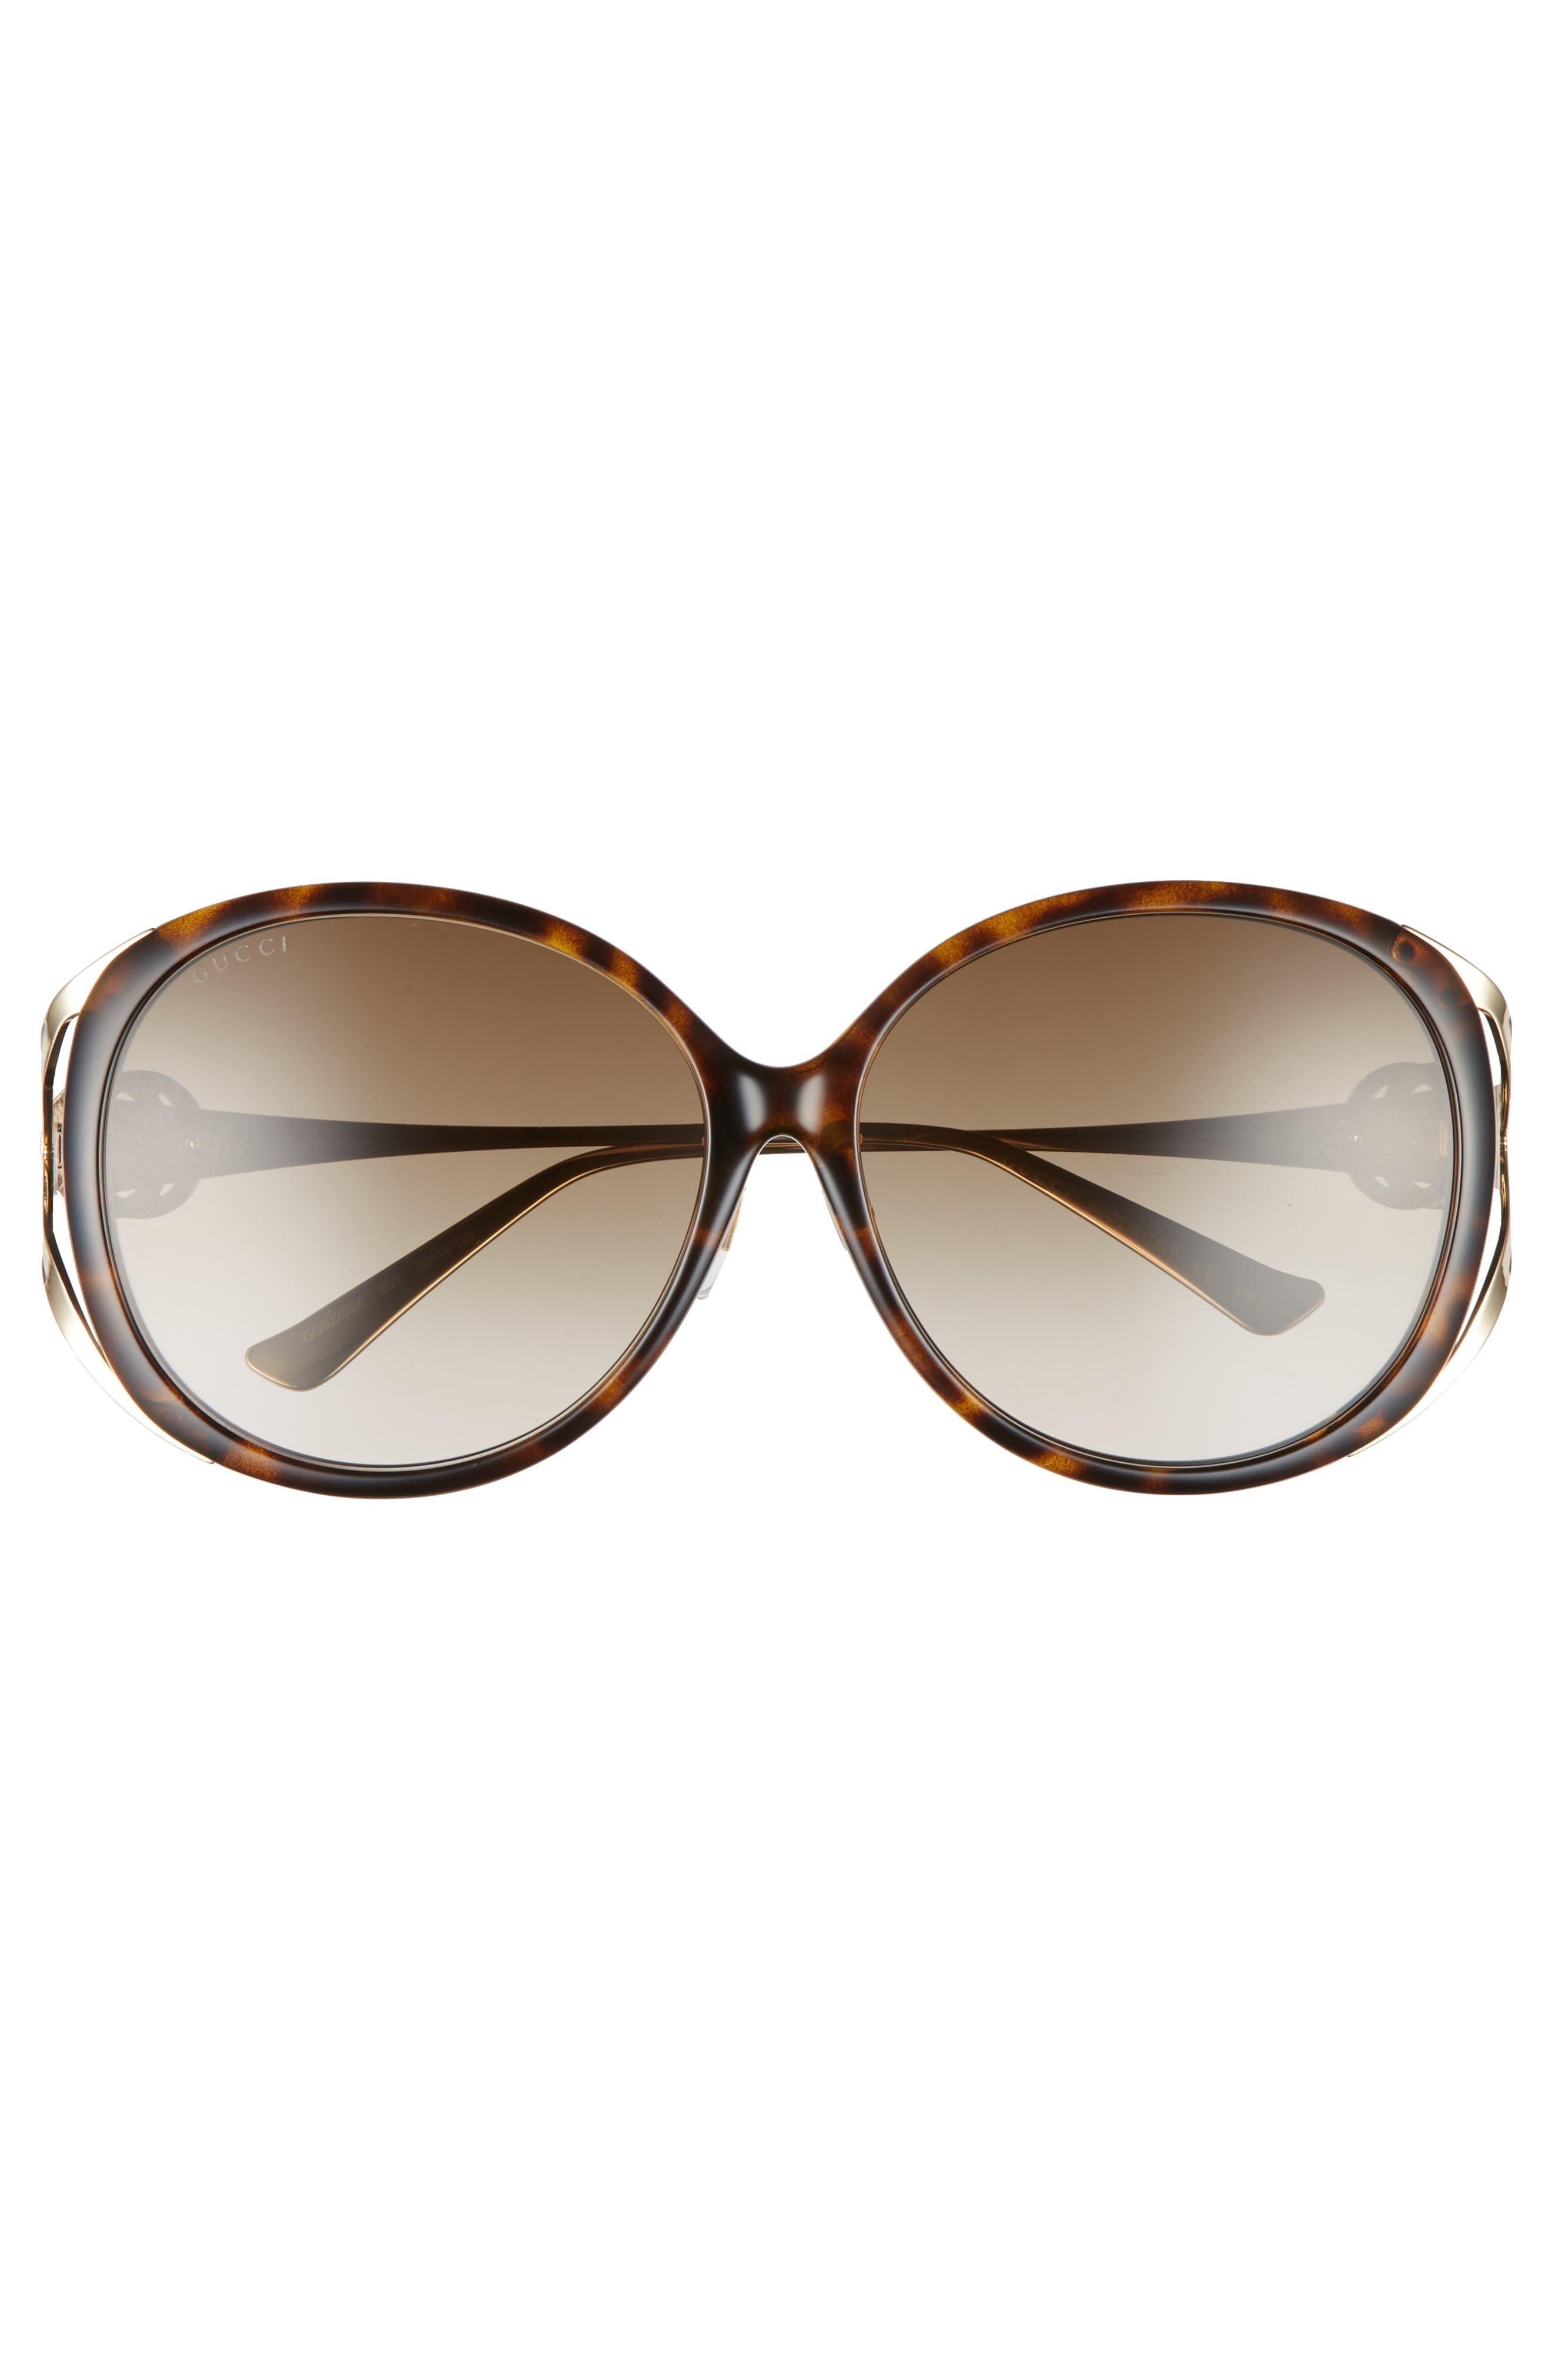 60mm Round Sunglasses,                             Alternate thumbnail 3, color,                             HAVANA